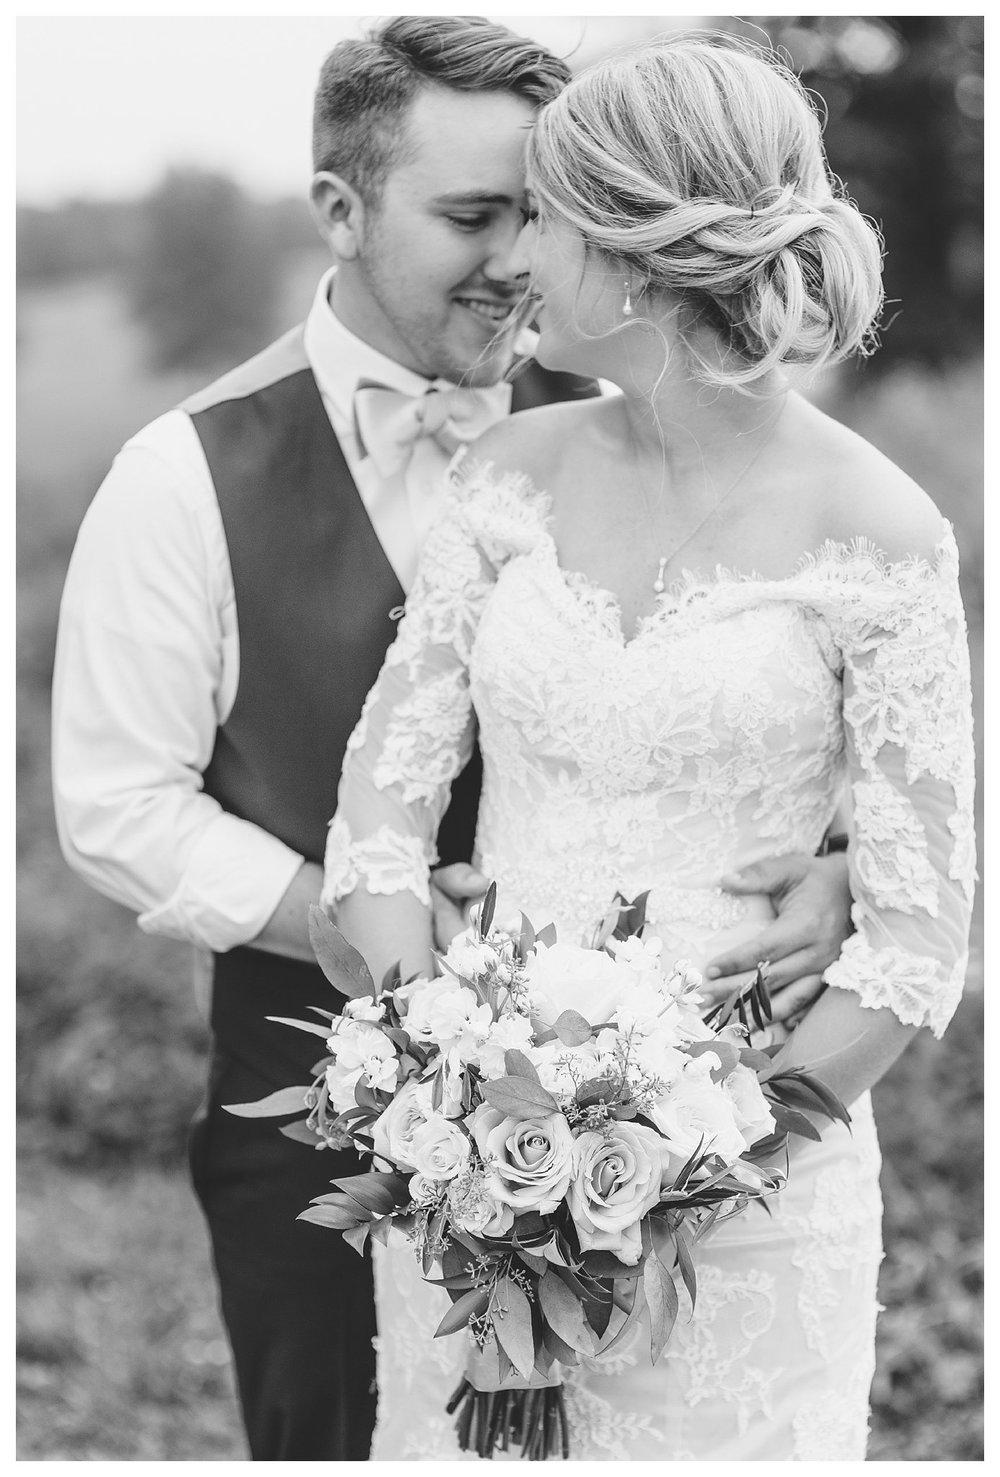 tower-park-mess-hall-everleigh-photography-northern-kentucky-wedding-photographer-36